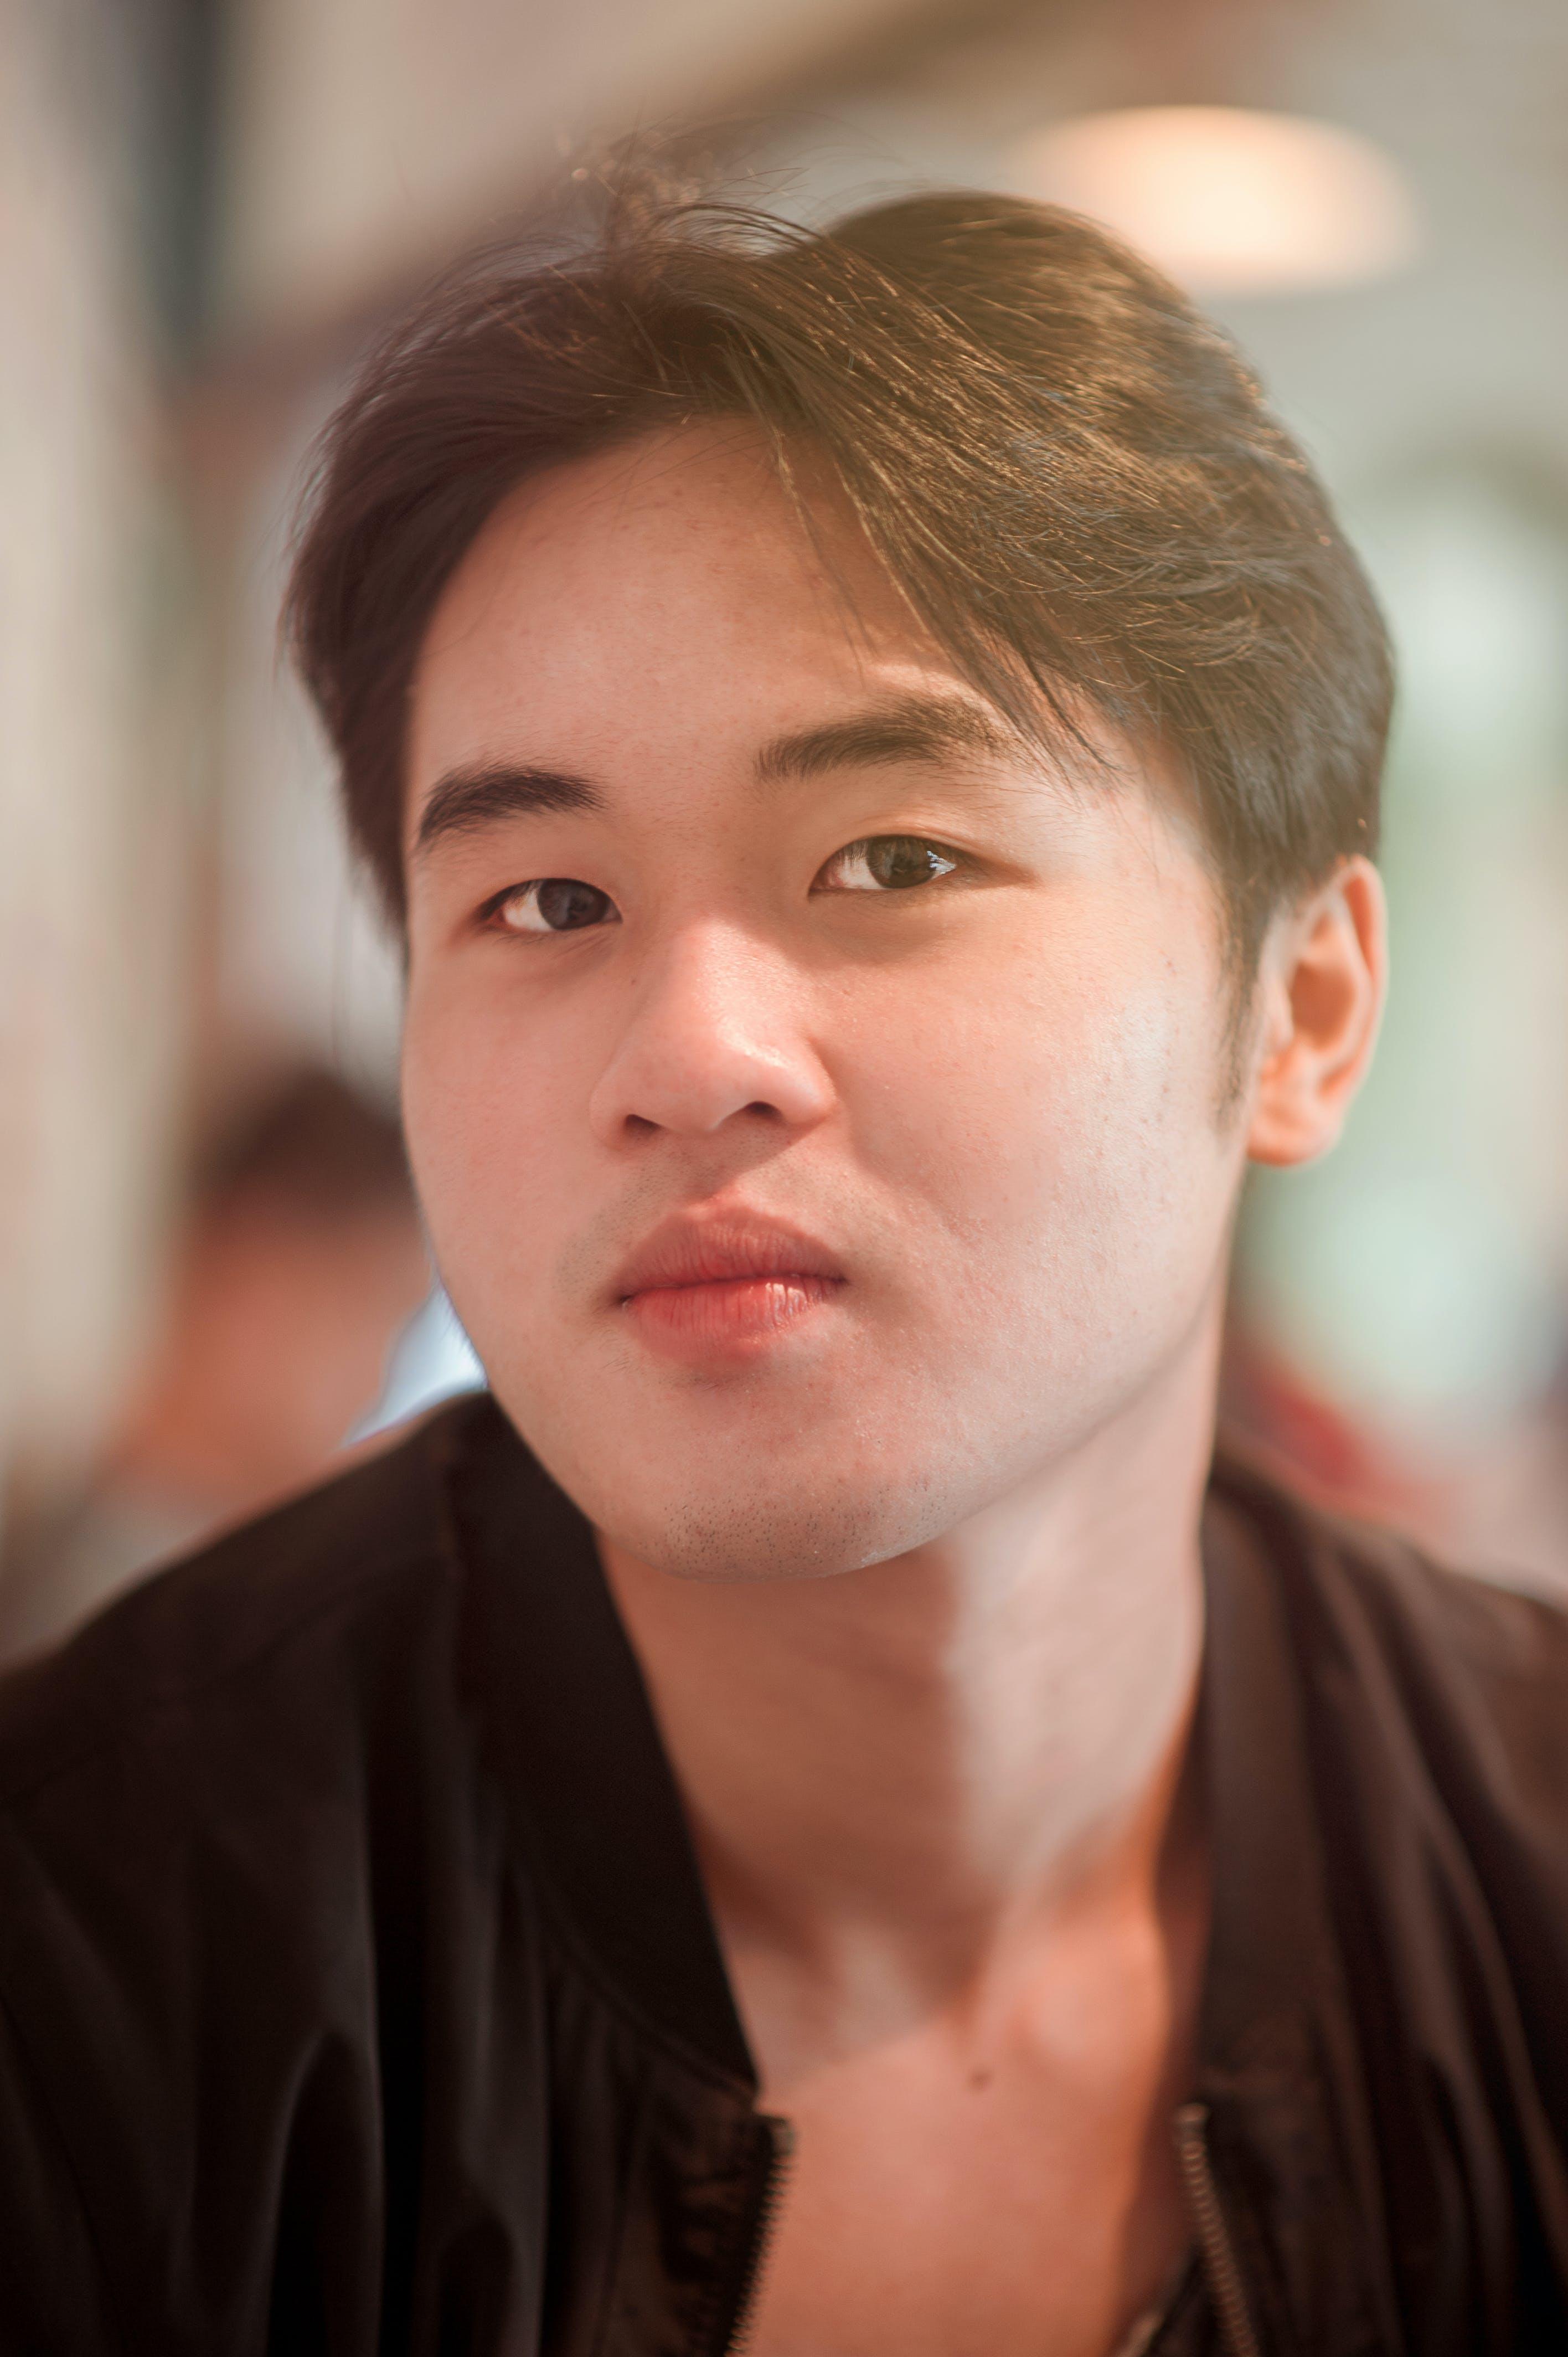 Close Up Photo of Man Wearing Black Shirt